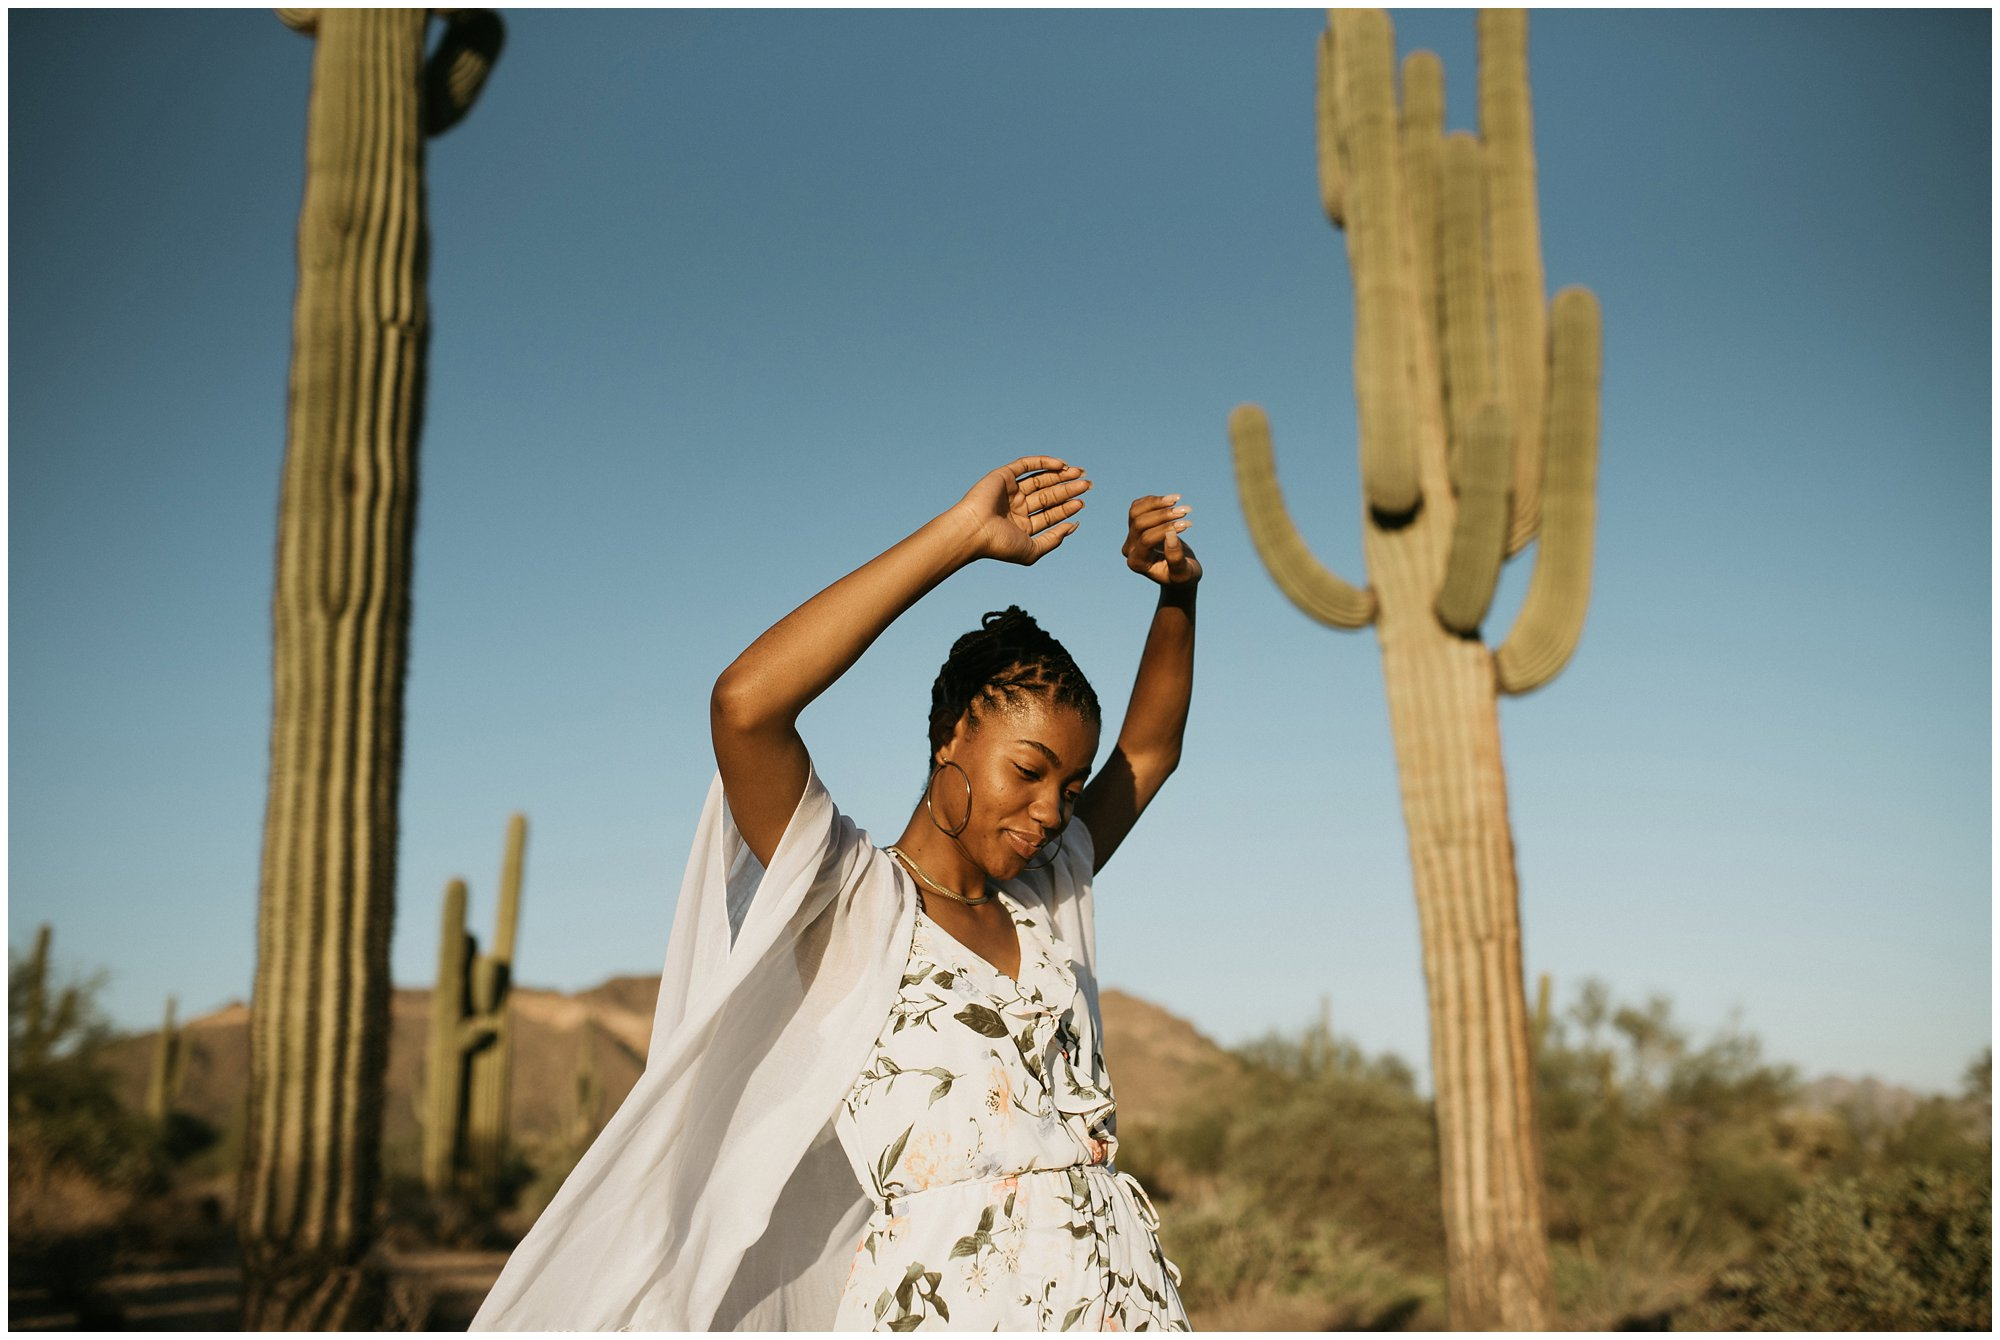 Desert Model Portrait Session - Ashtyn Nicole Photo_0015.jpg